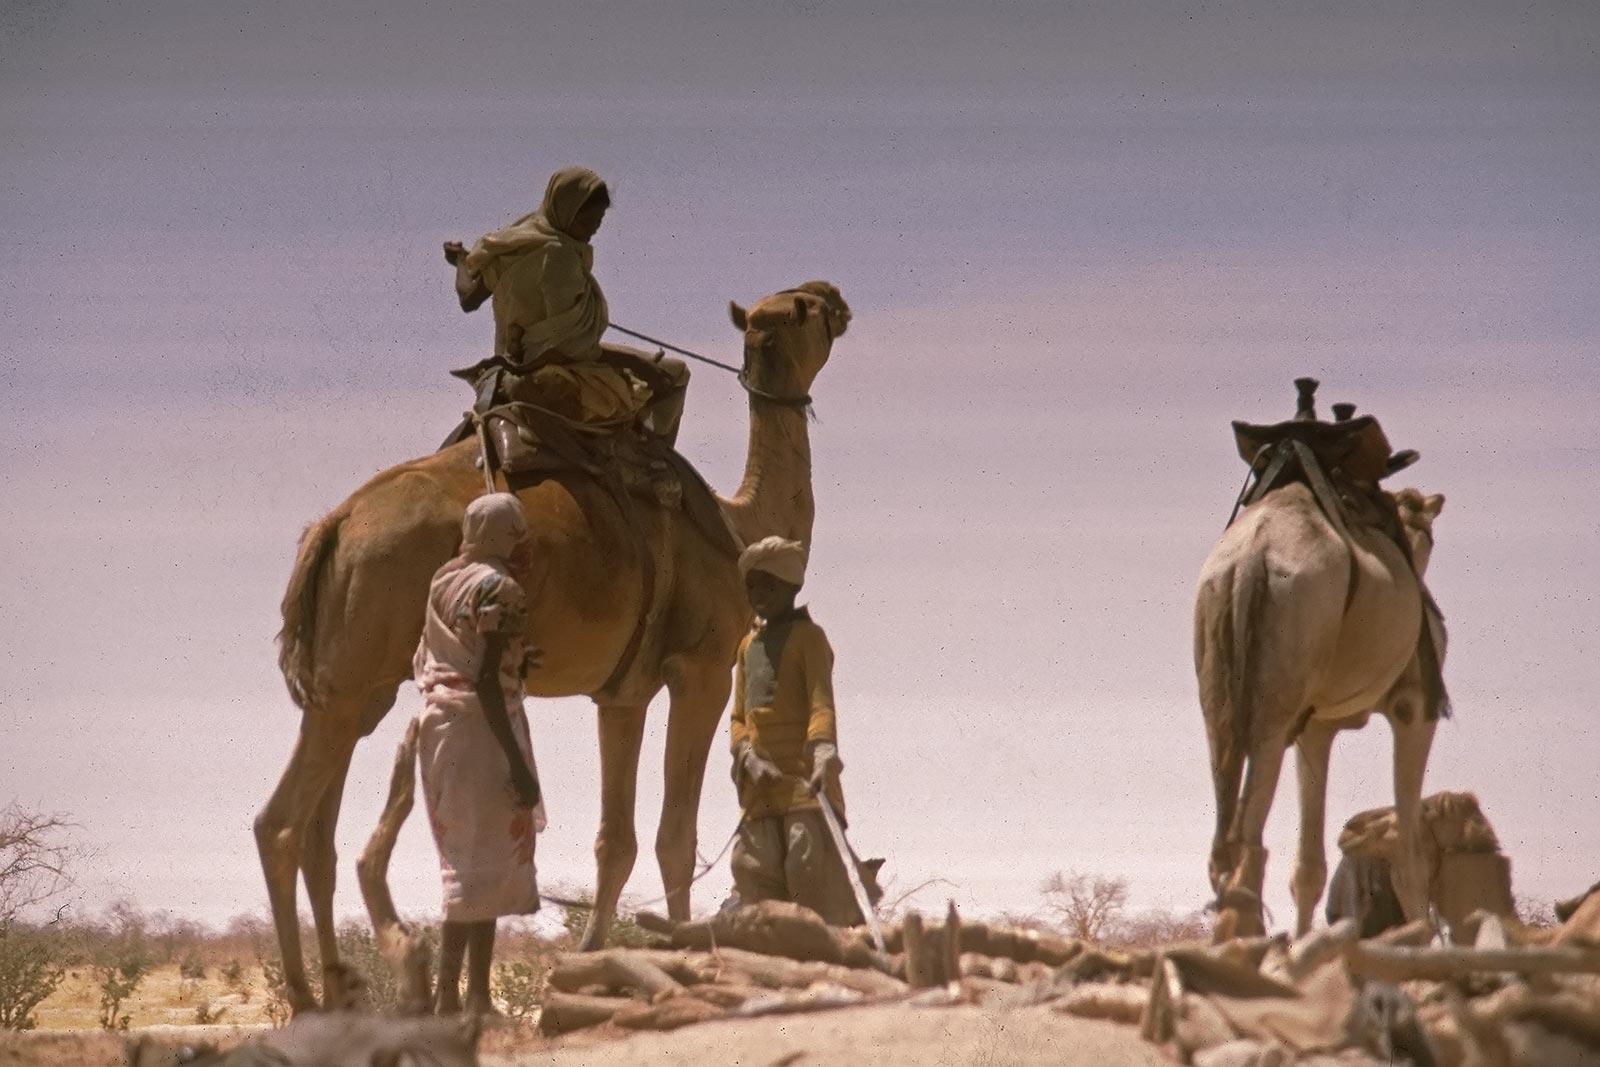 sudan-egypt-border-trucking-unimog